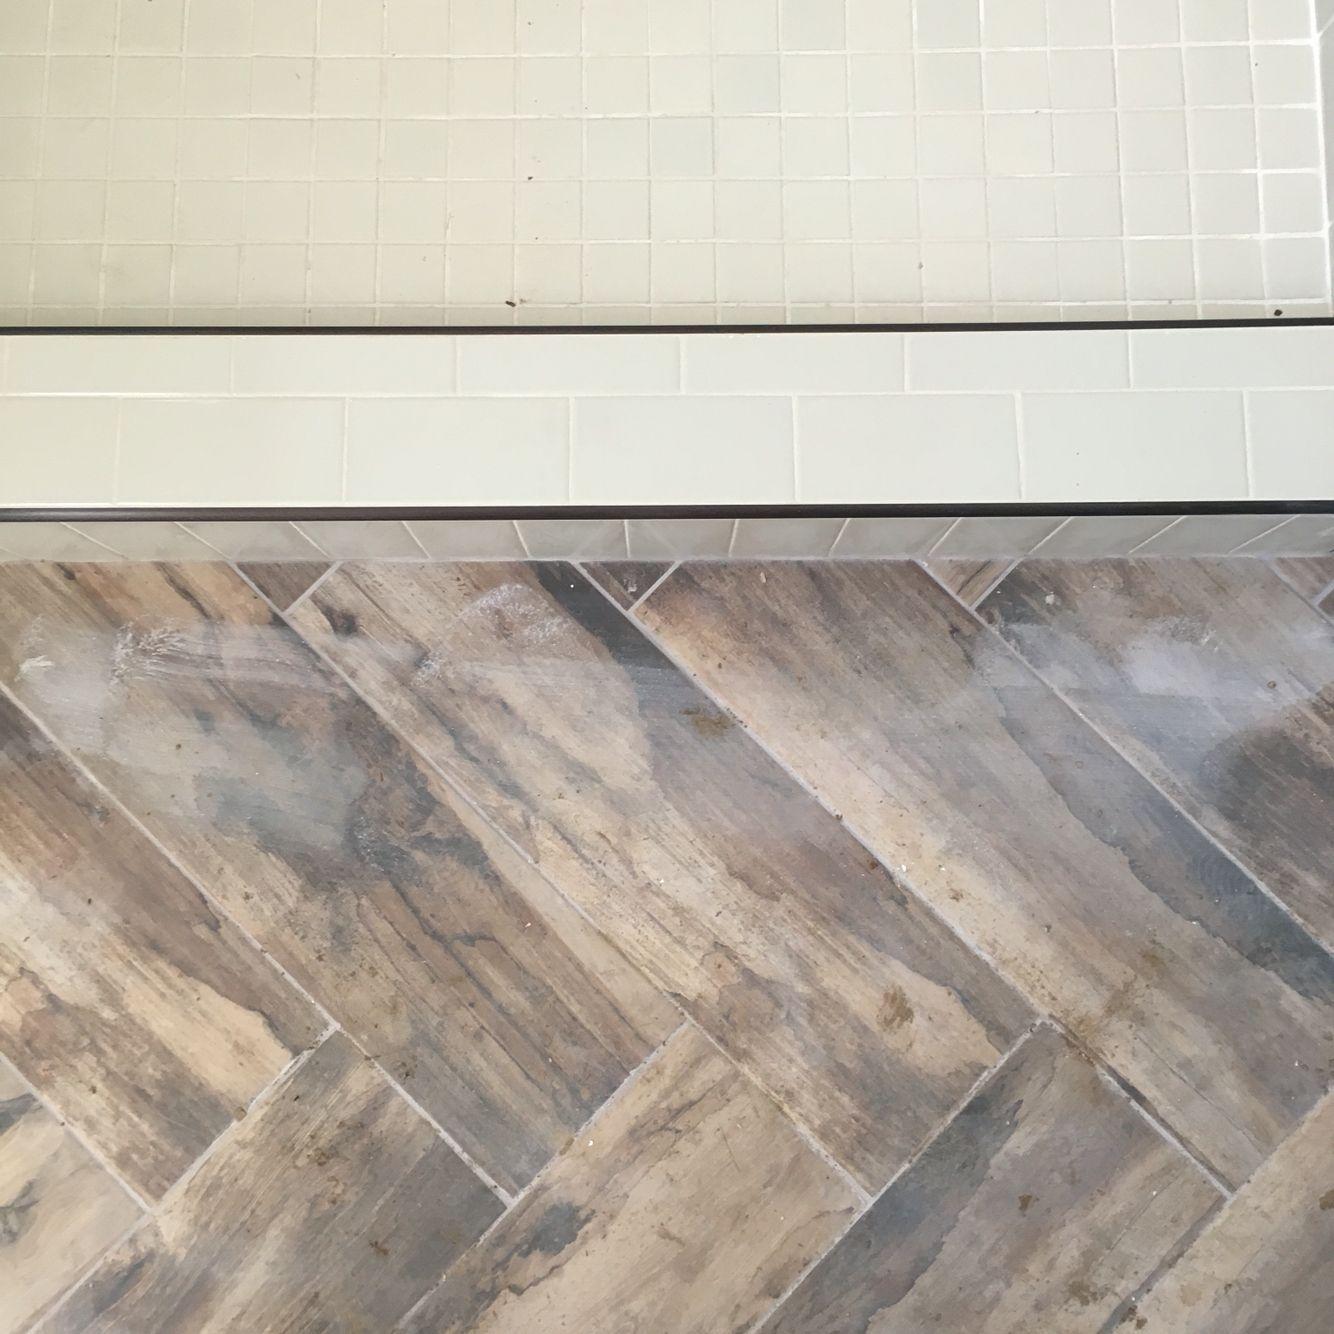 Reclaimed subway tile